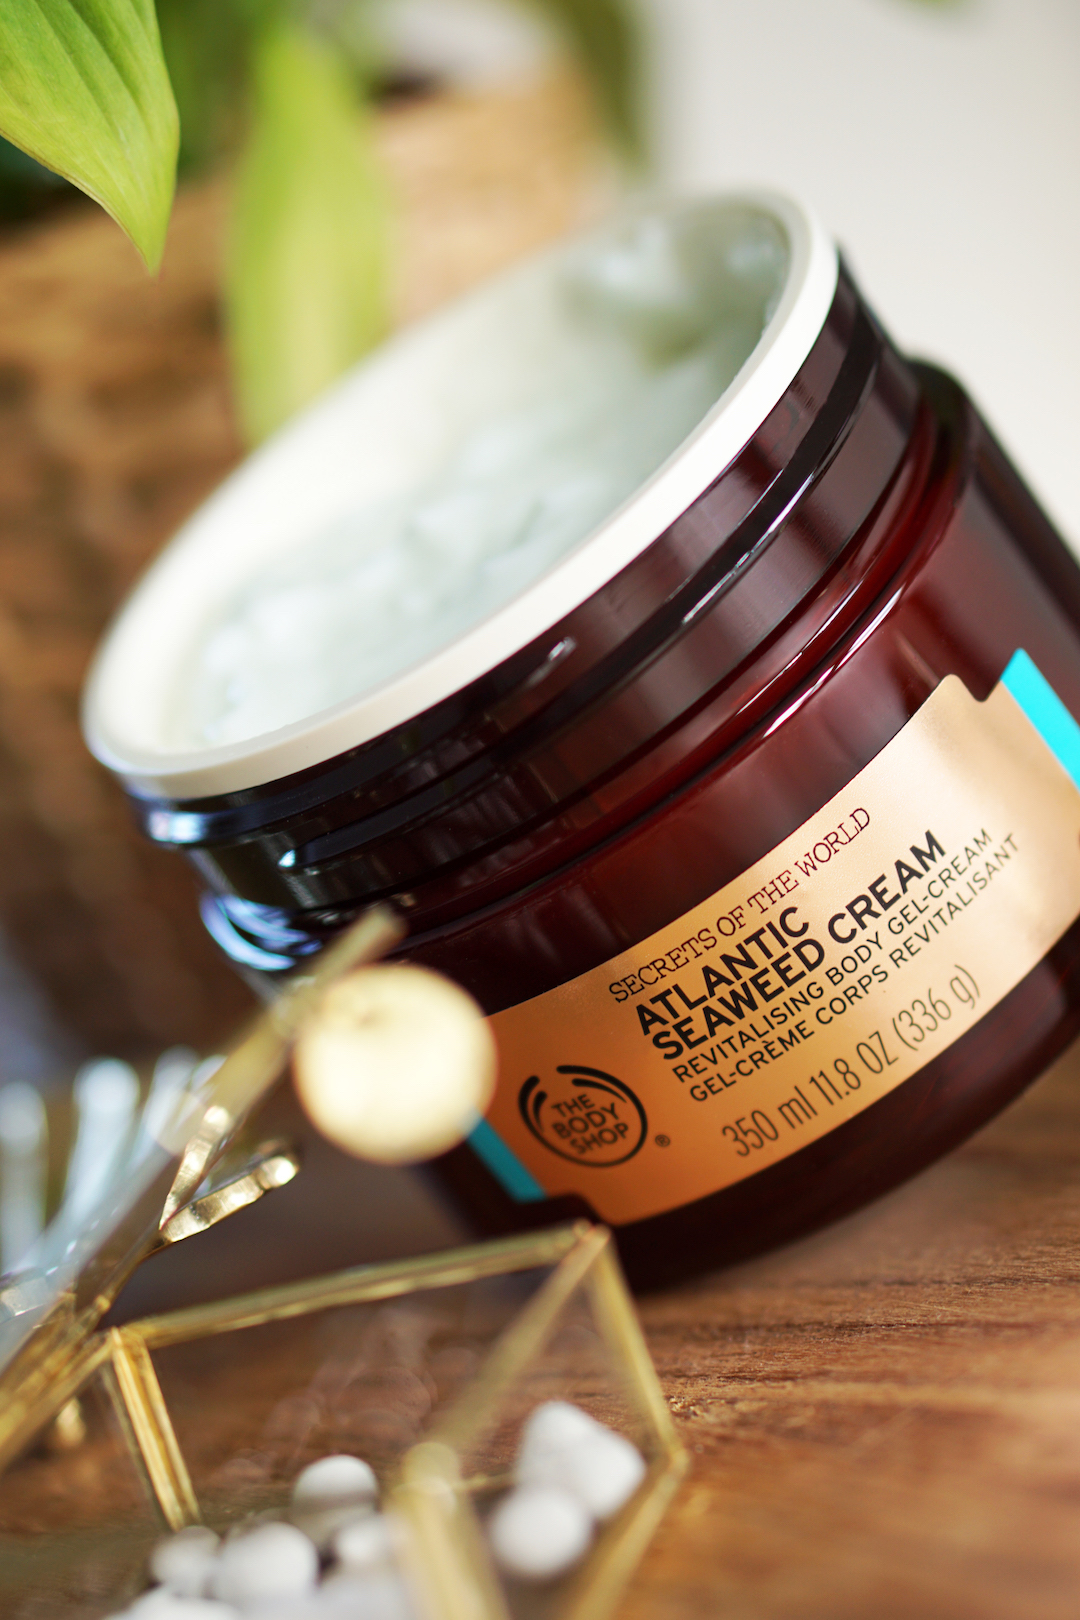 Secrets Of The World Brazilian Cupuaçu Scrub-in-Oil / Atlantic Seaweed Cream